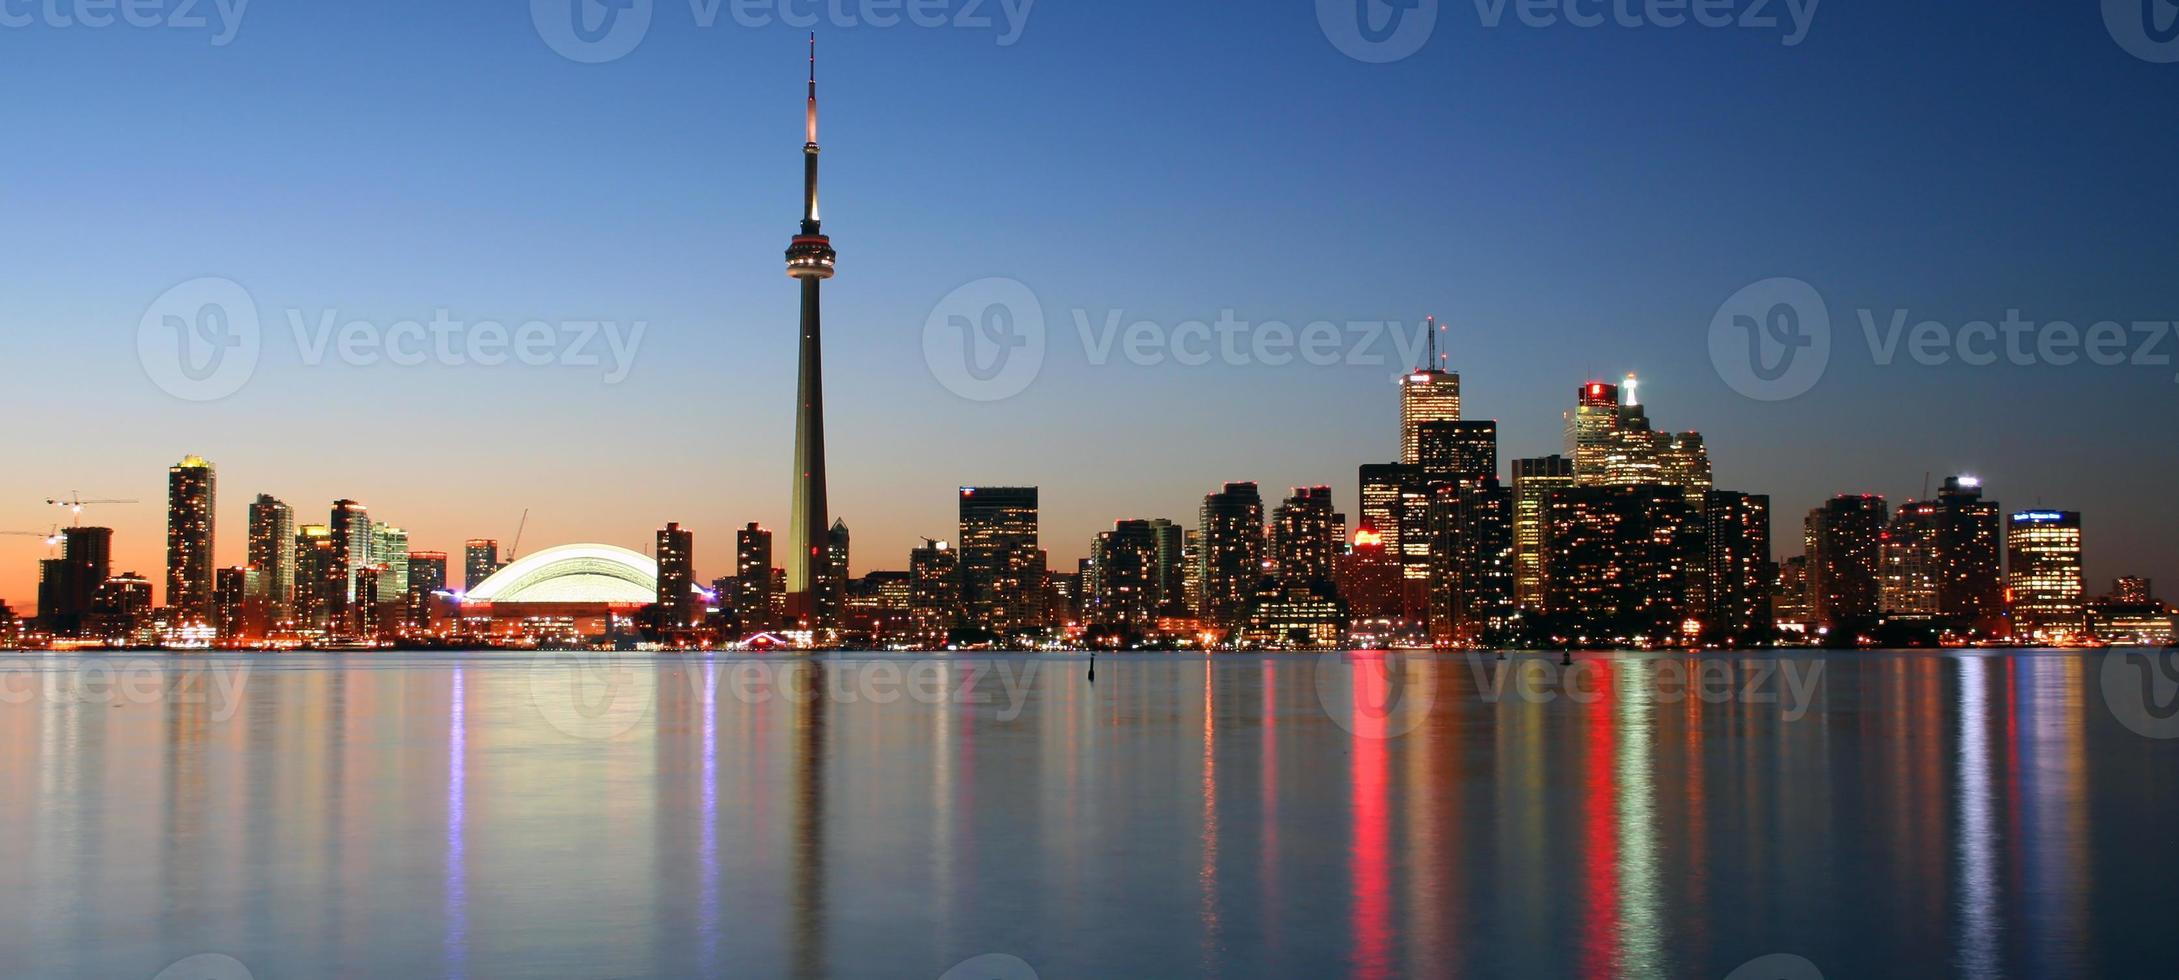 skyline di Toronto al tramonto foto